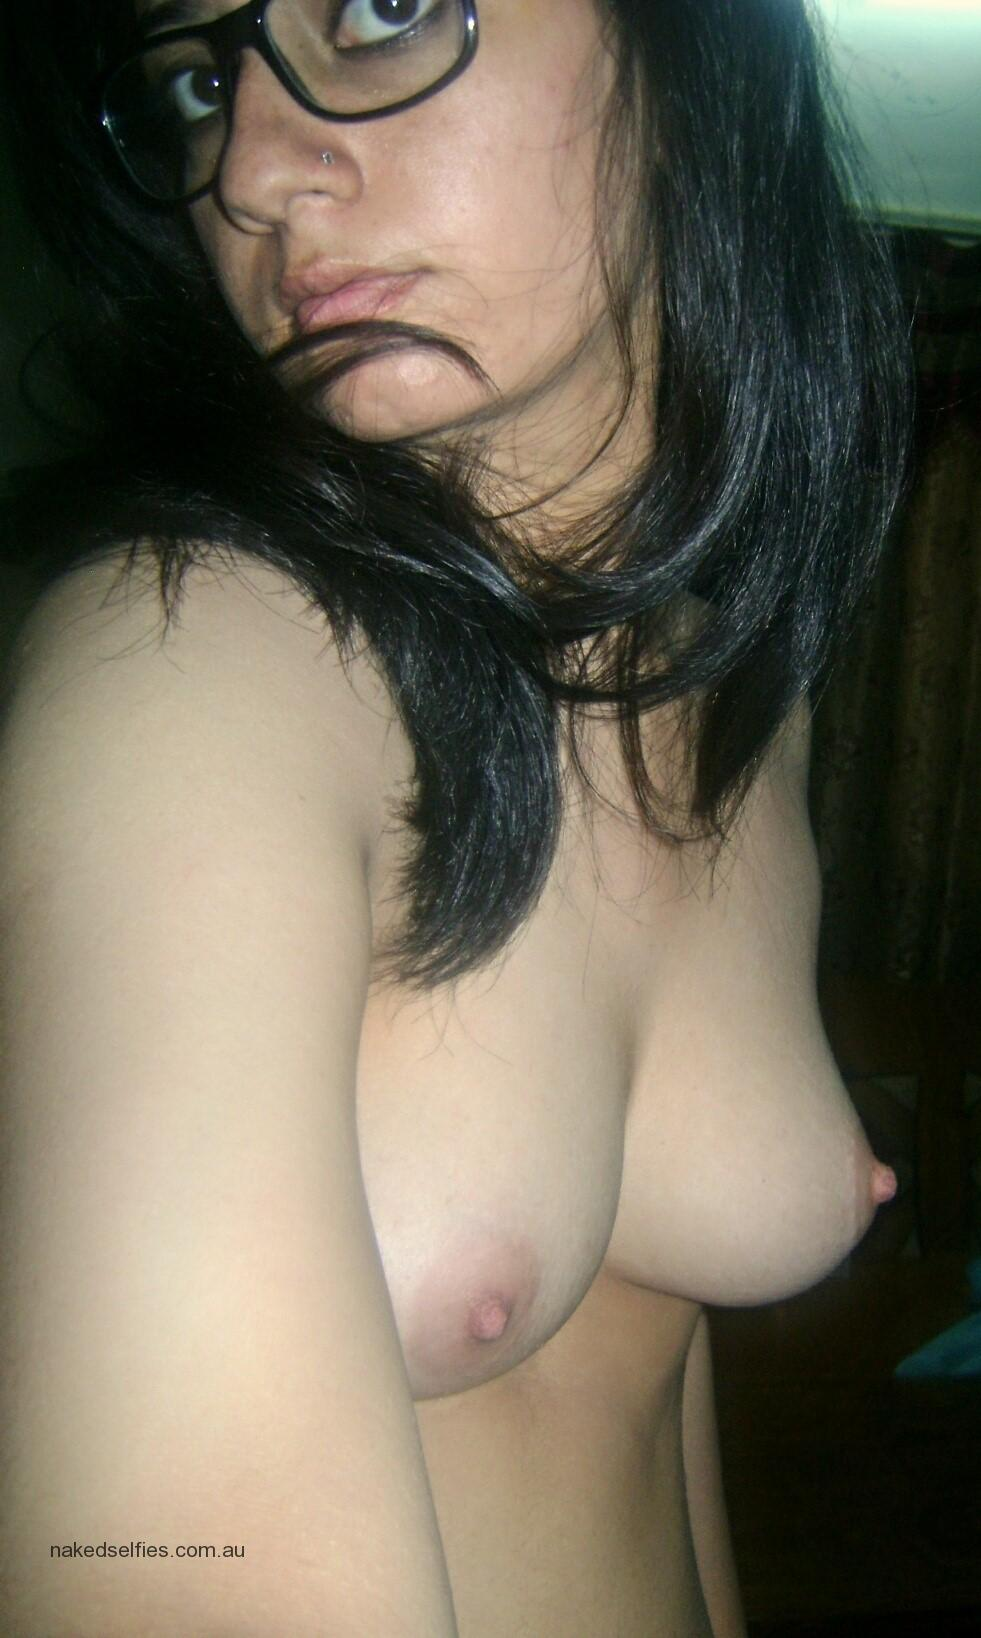 kashmiri My Naked Selfie